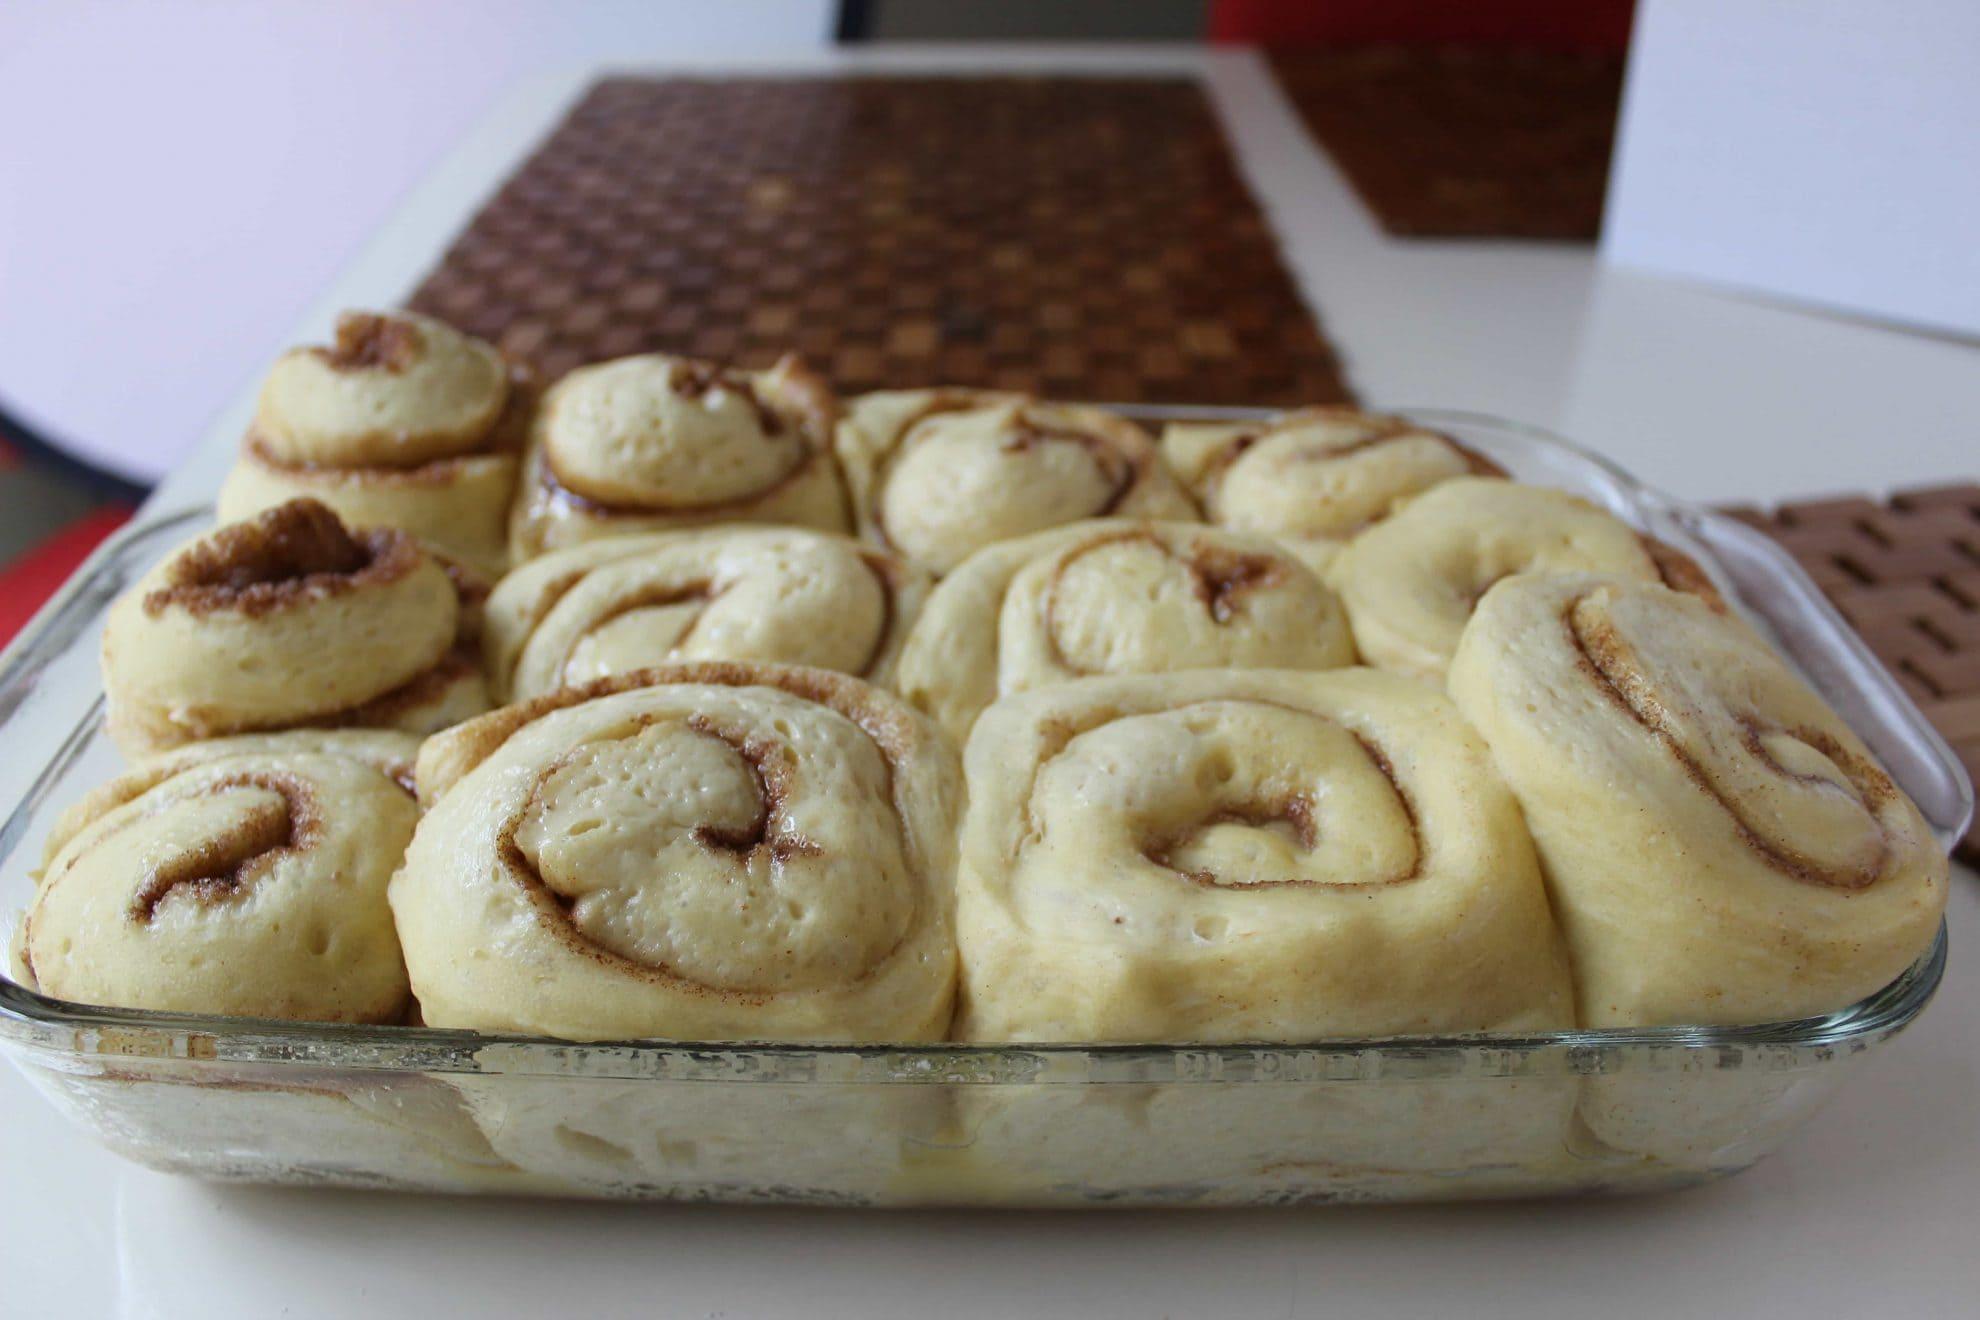 cinnamon buns rising before baking